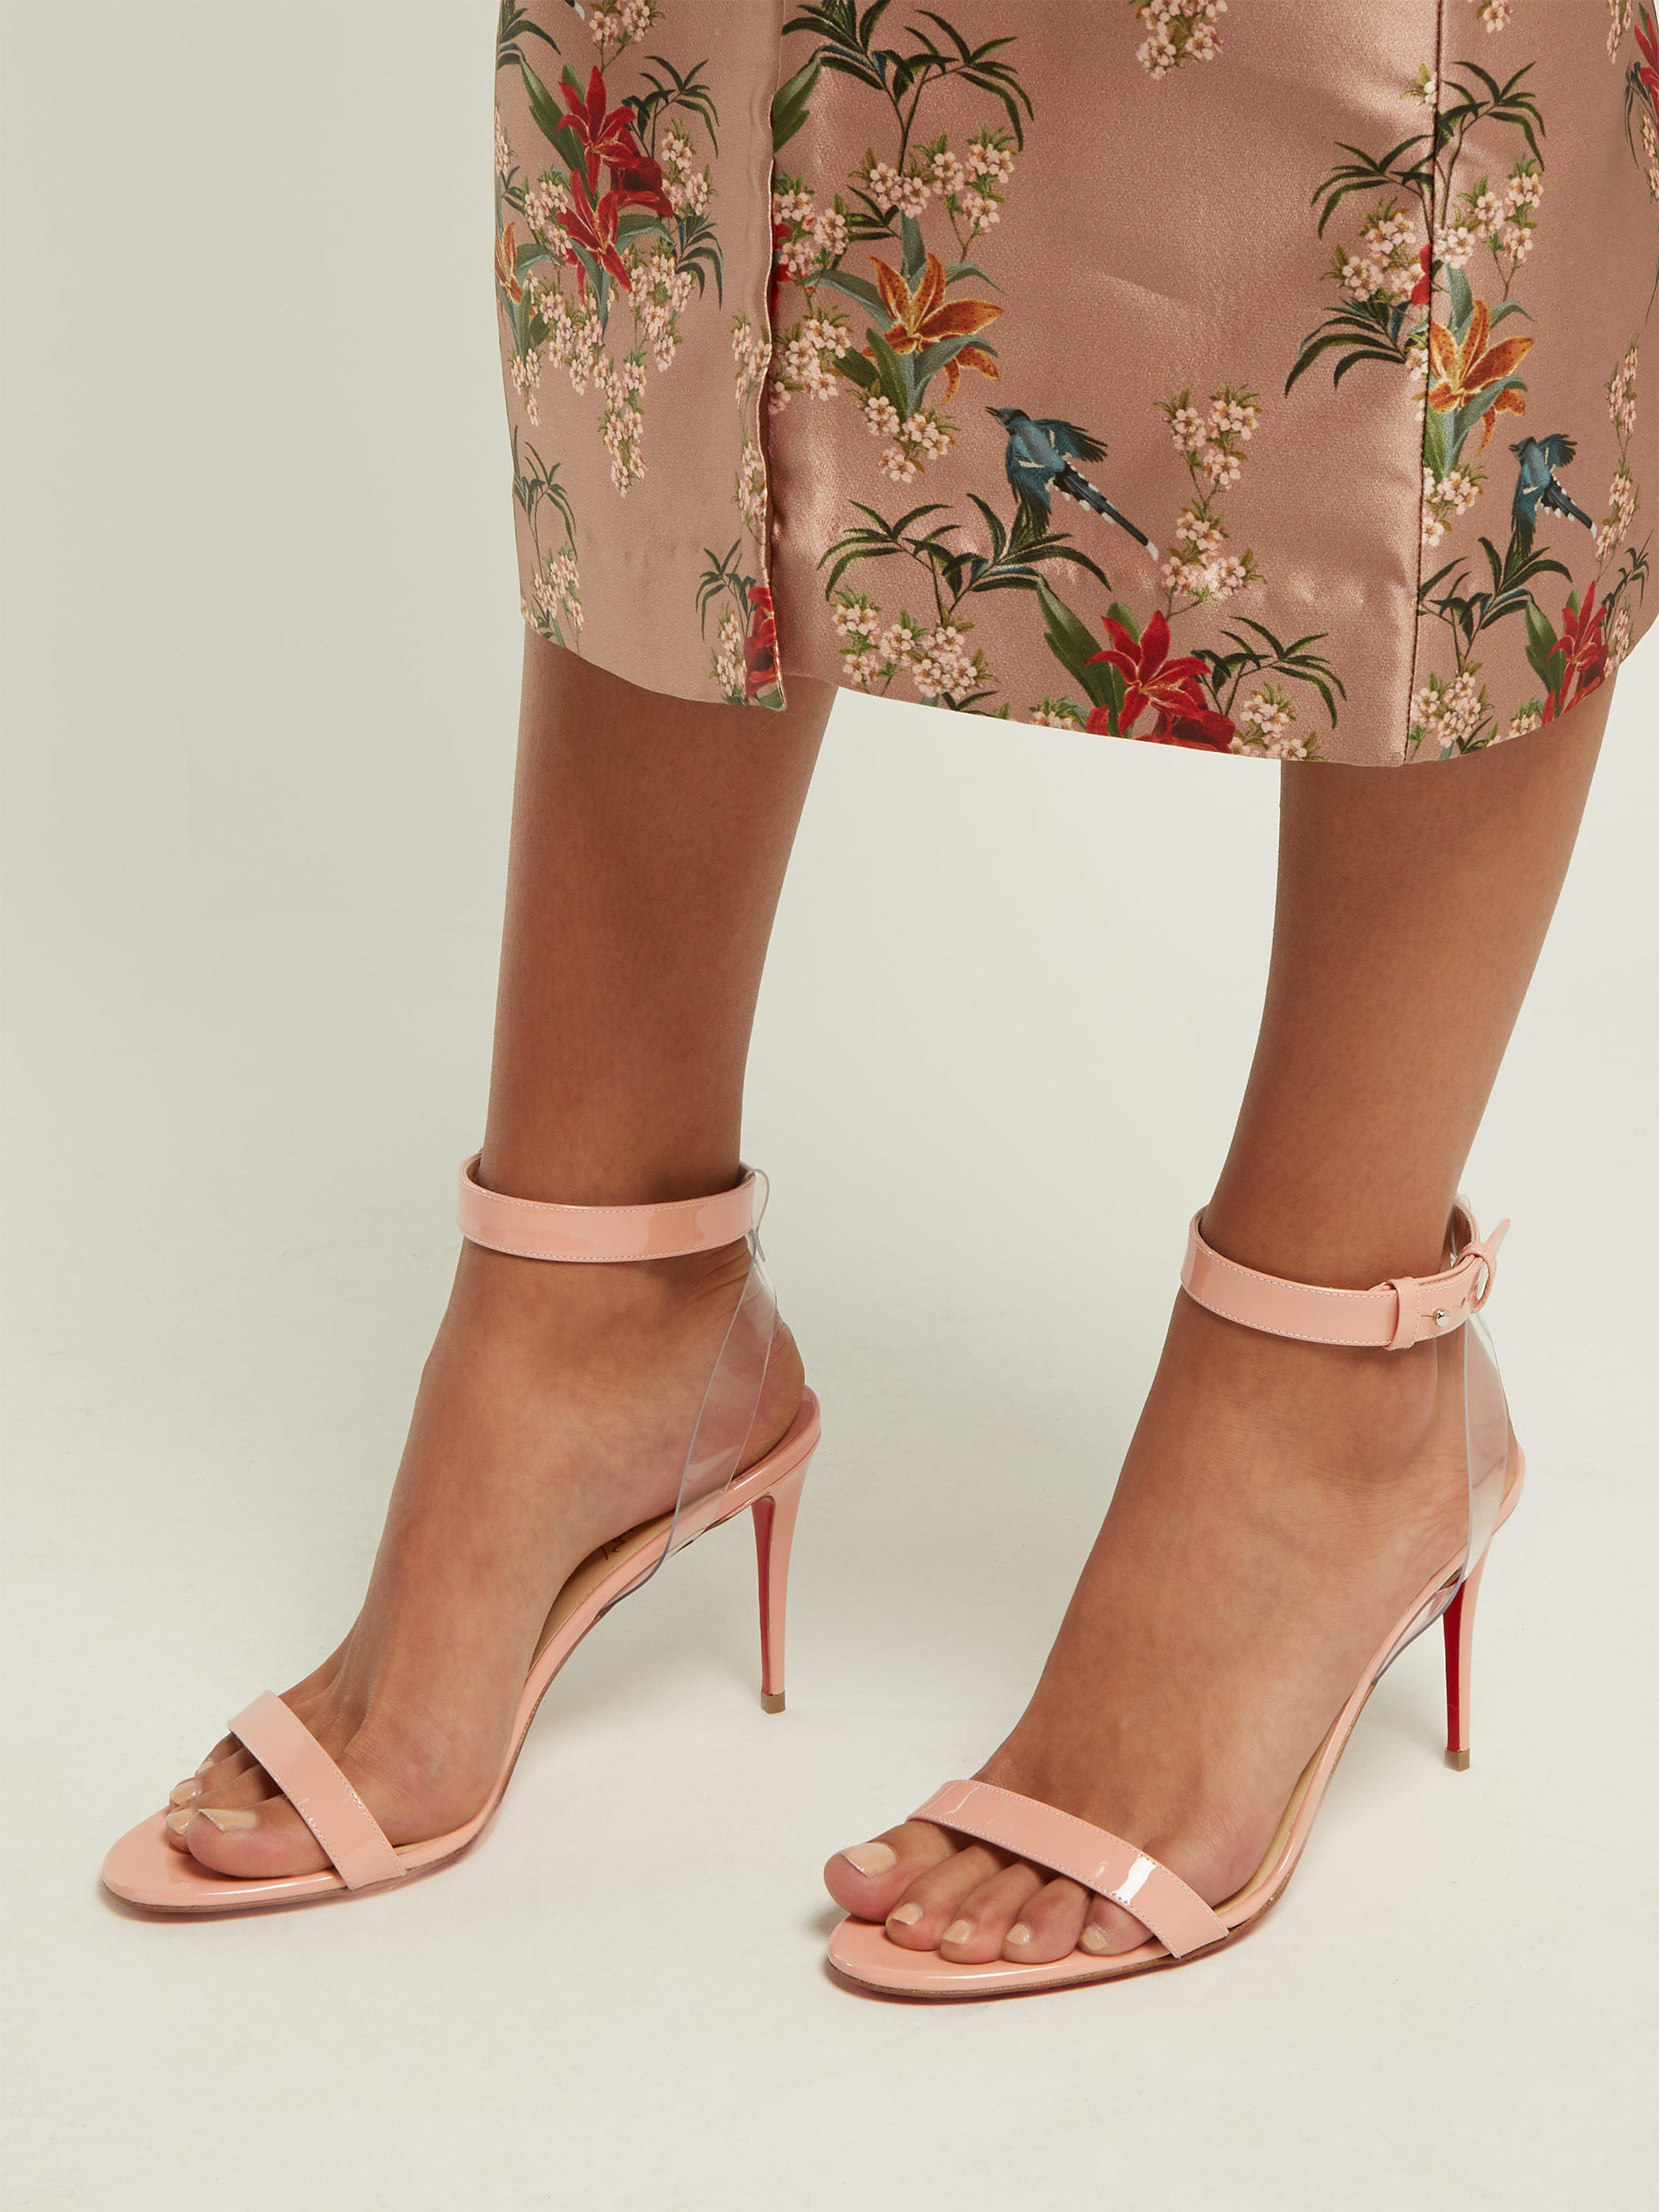 871bef9270ee Christian Louboutin - Pink Jonatina 85 Patent Leather Sandals - Lyst. View  fullscreen